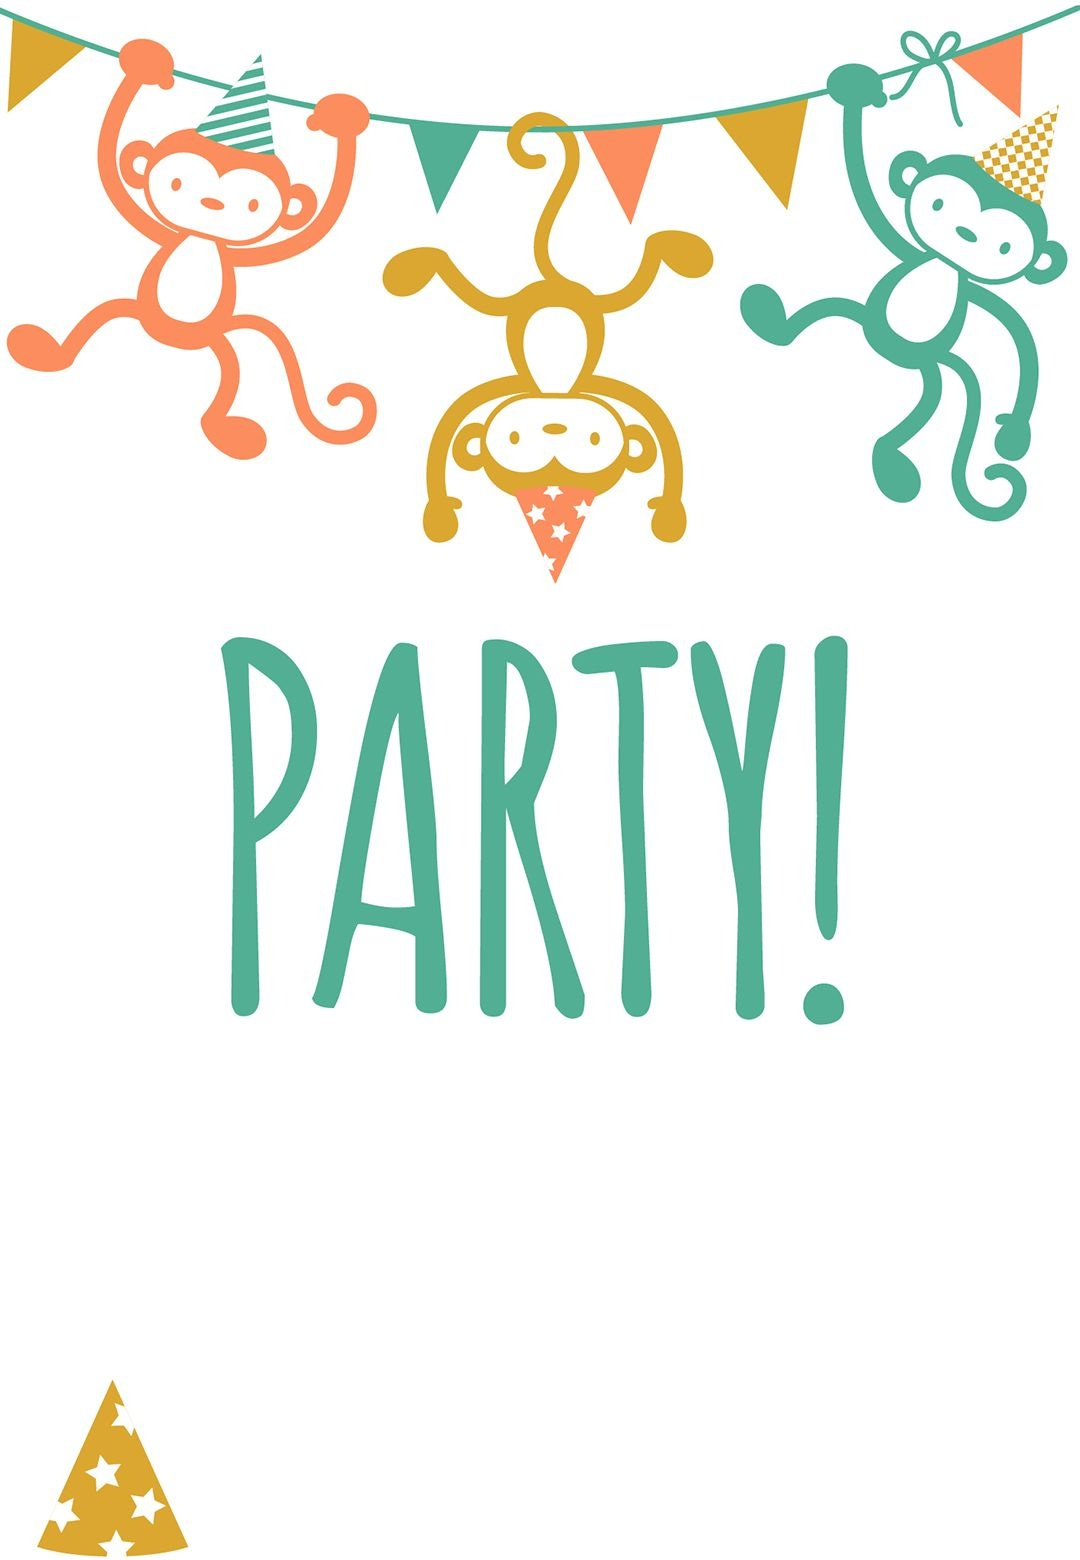 Free Printable Childrens Party Invitation | Free Printables | Free - Free Printable Toddler Birthday Invitations